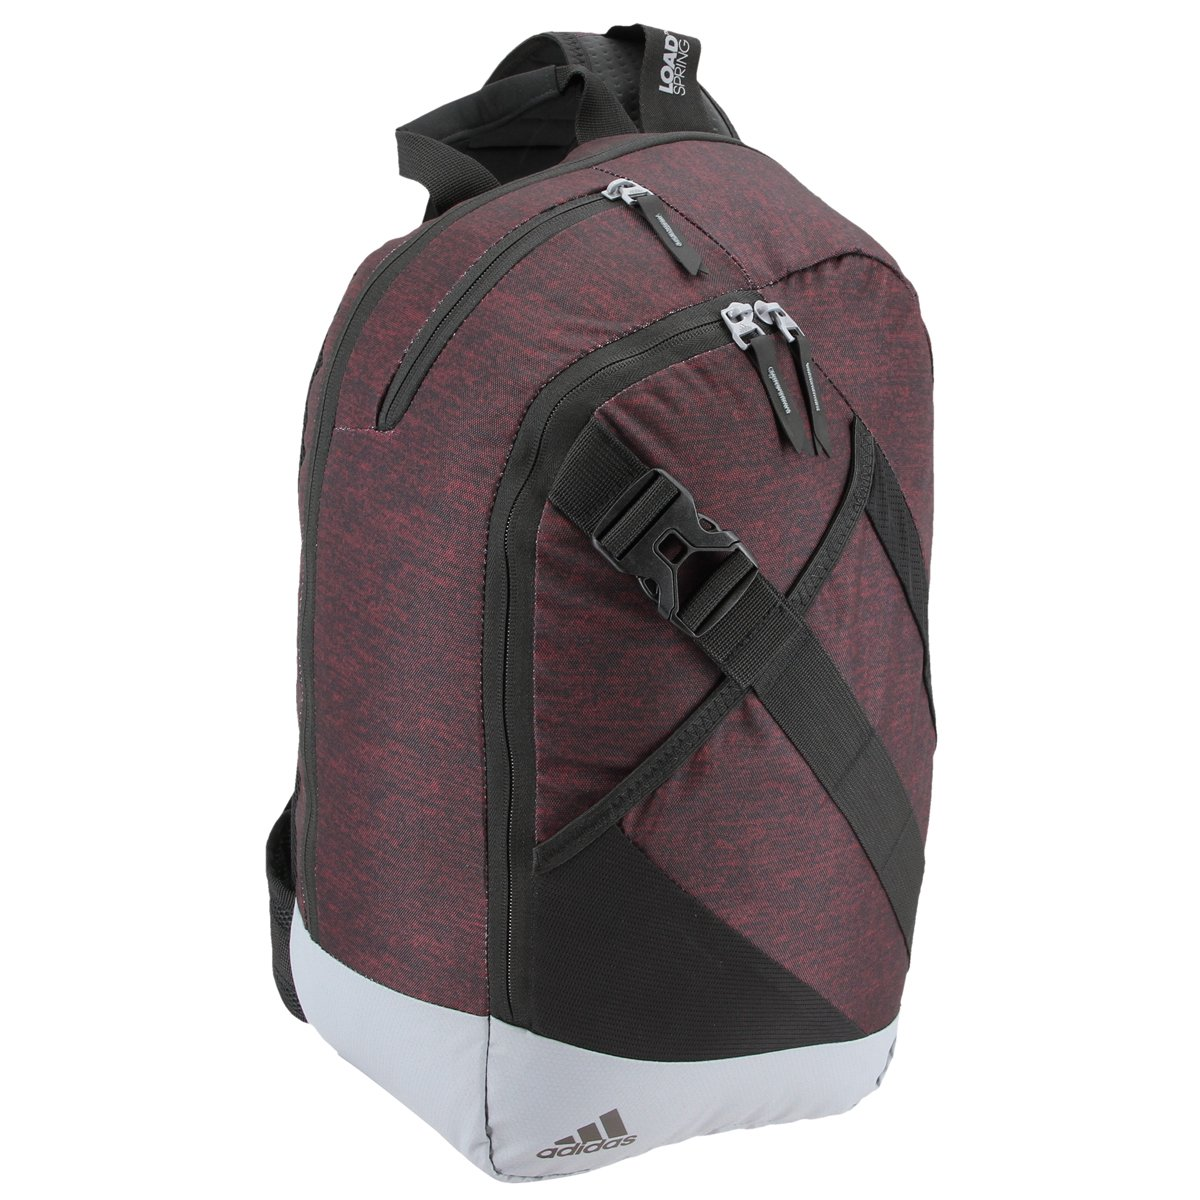 98bb77fb4b9 high-quality adidas Citywide Sling Backpack - tiendapoete.com